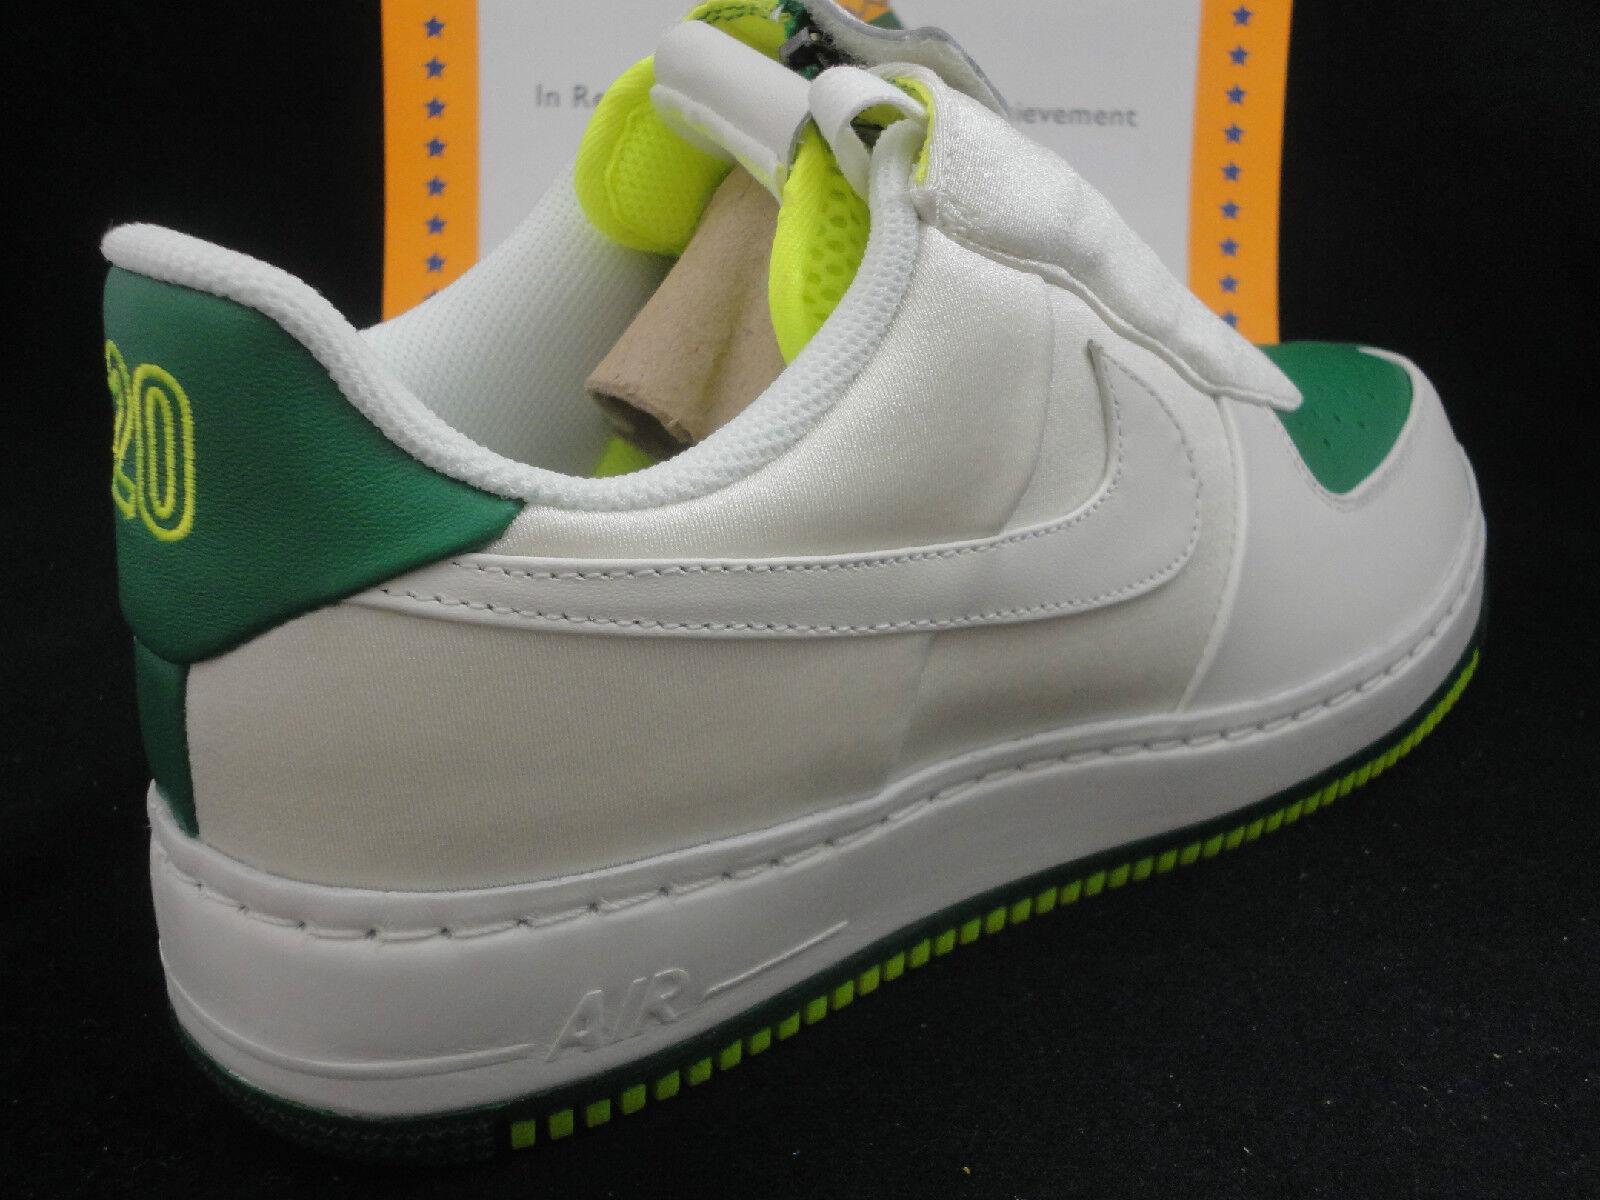 Nike air force 1 niedrig cmft lw - payton, sig, gary payton, - der handschuh, größe. e4b85e